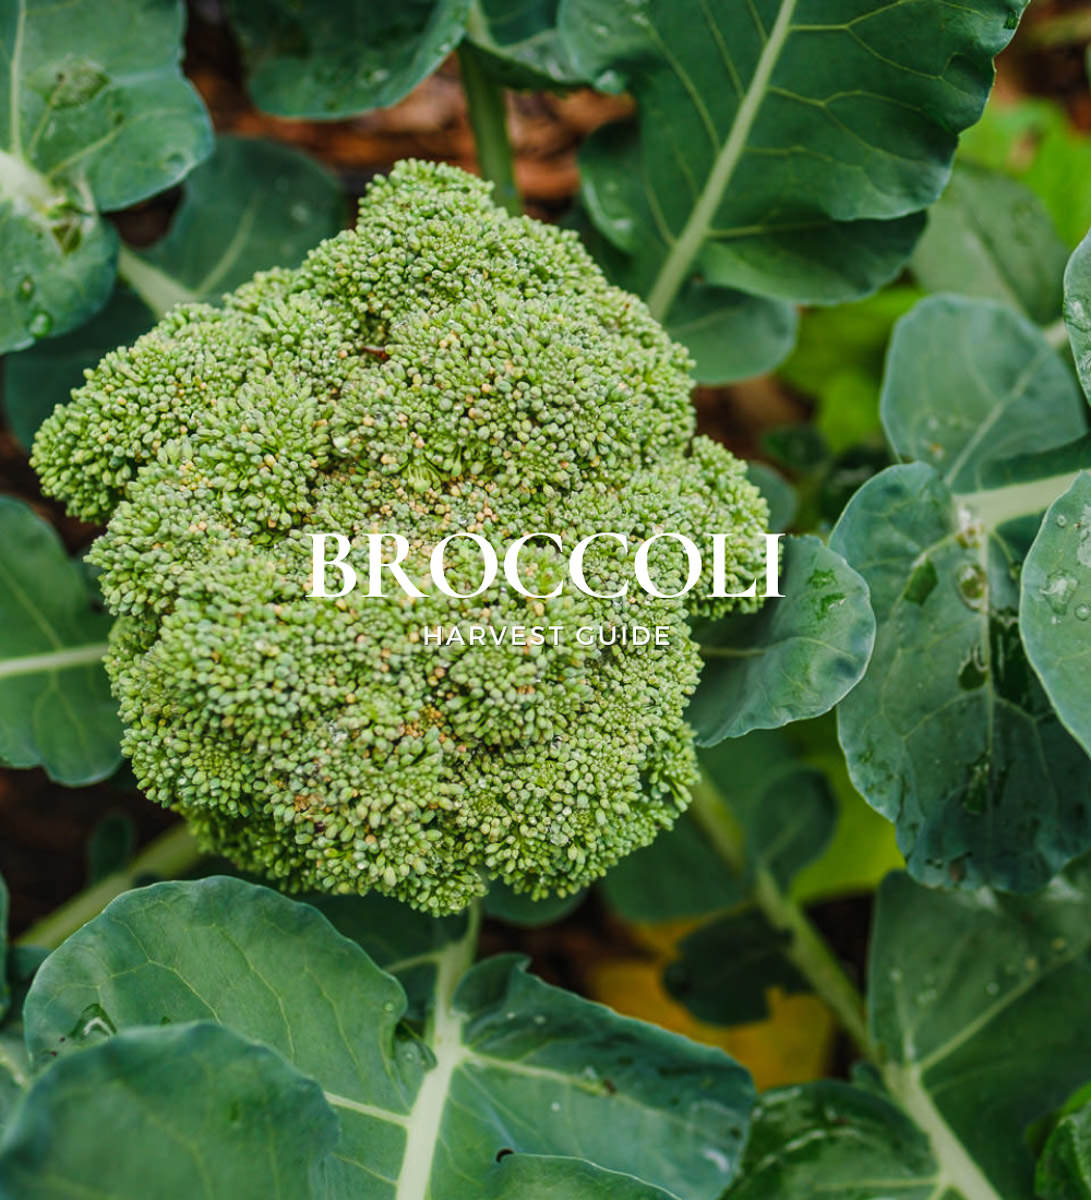 how to harvest broccoli